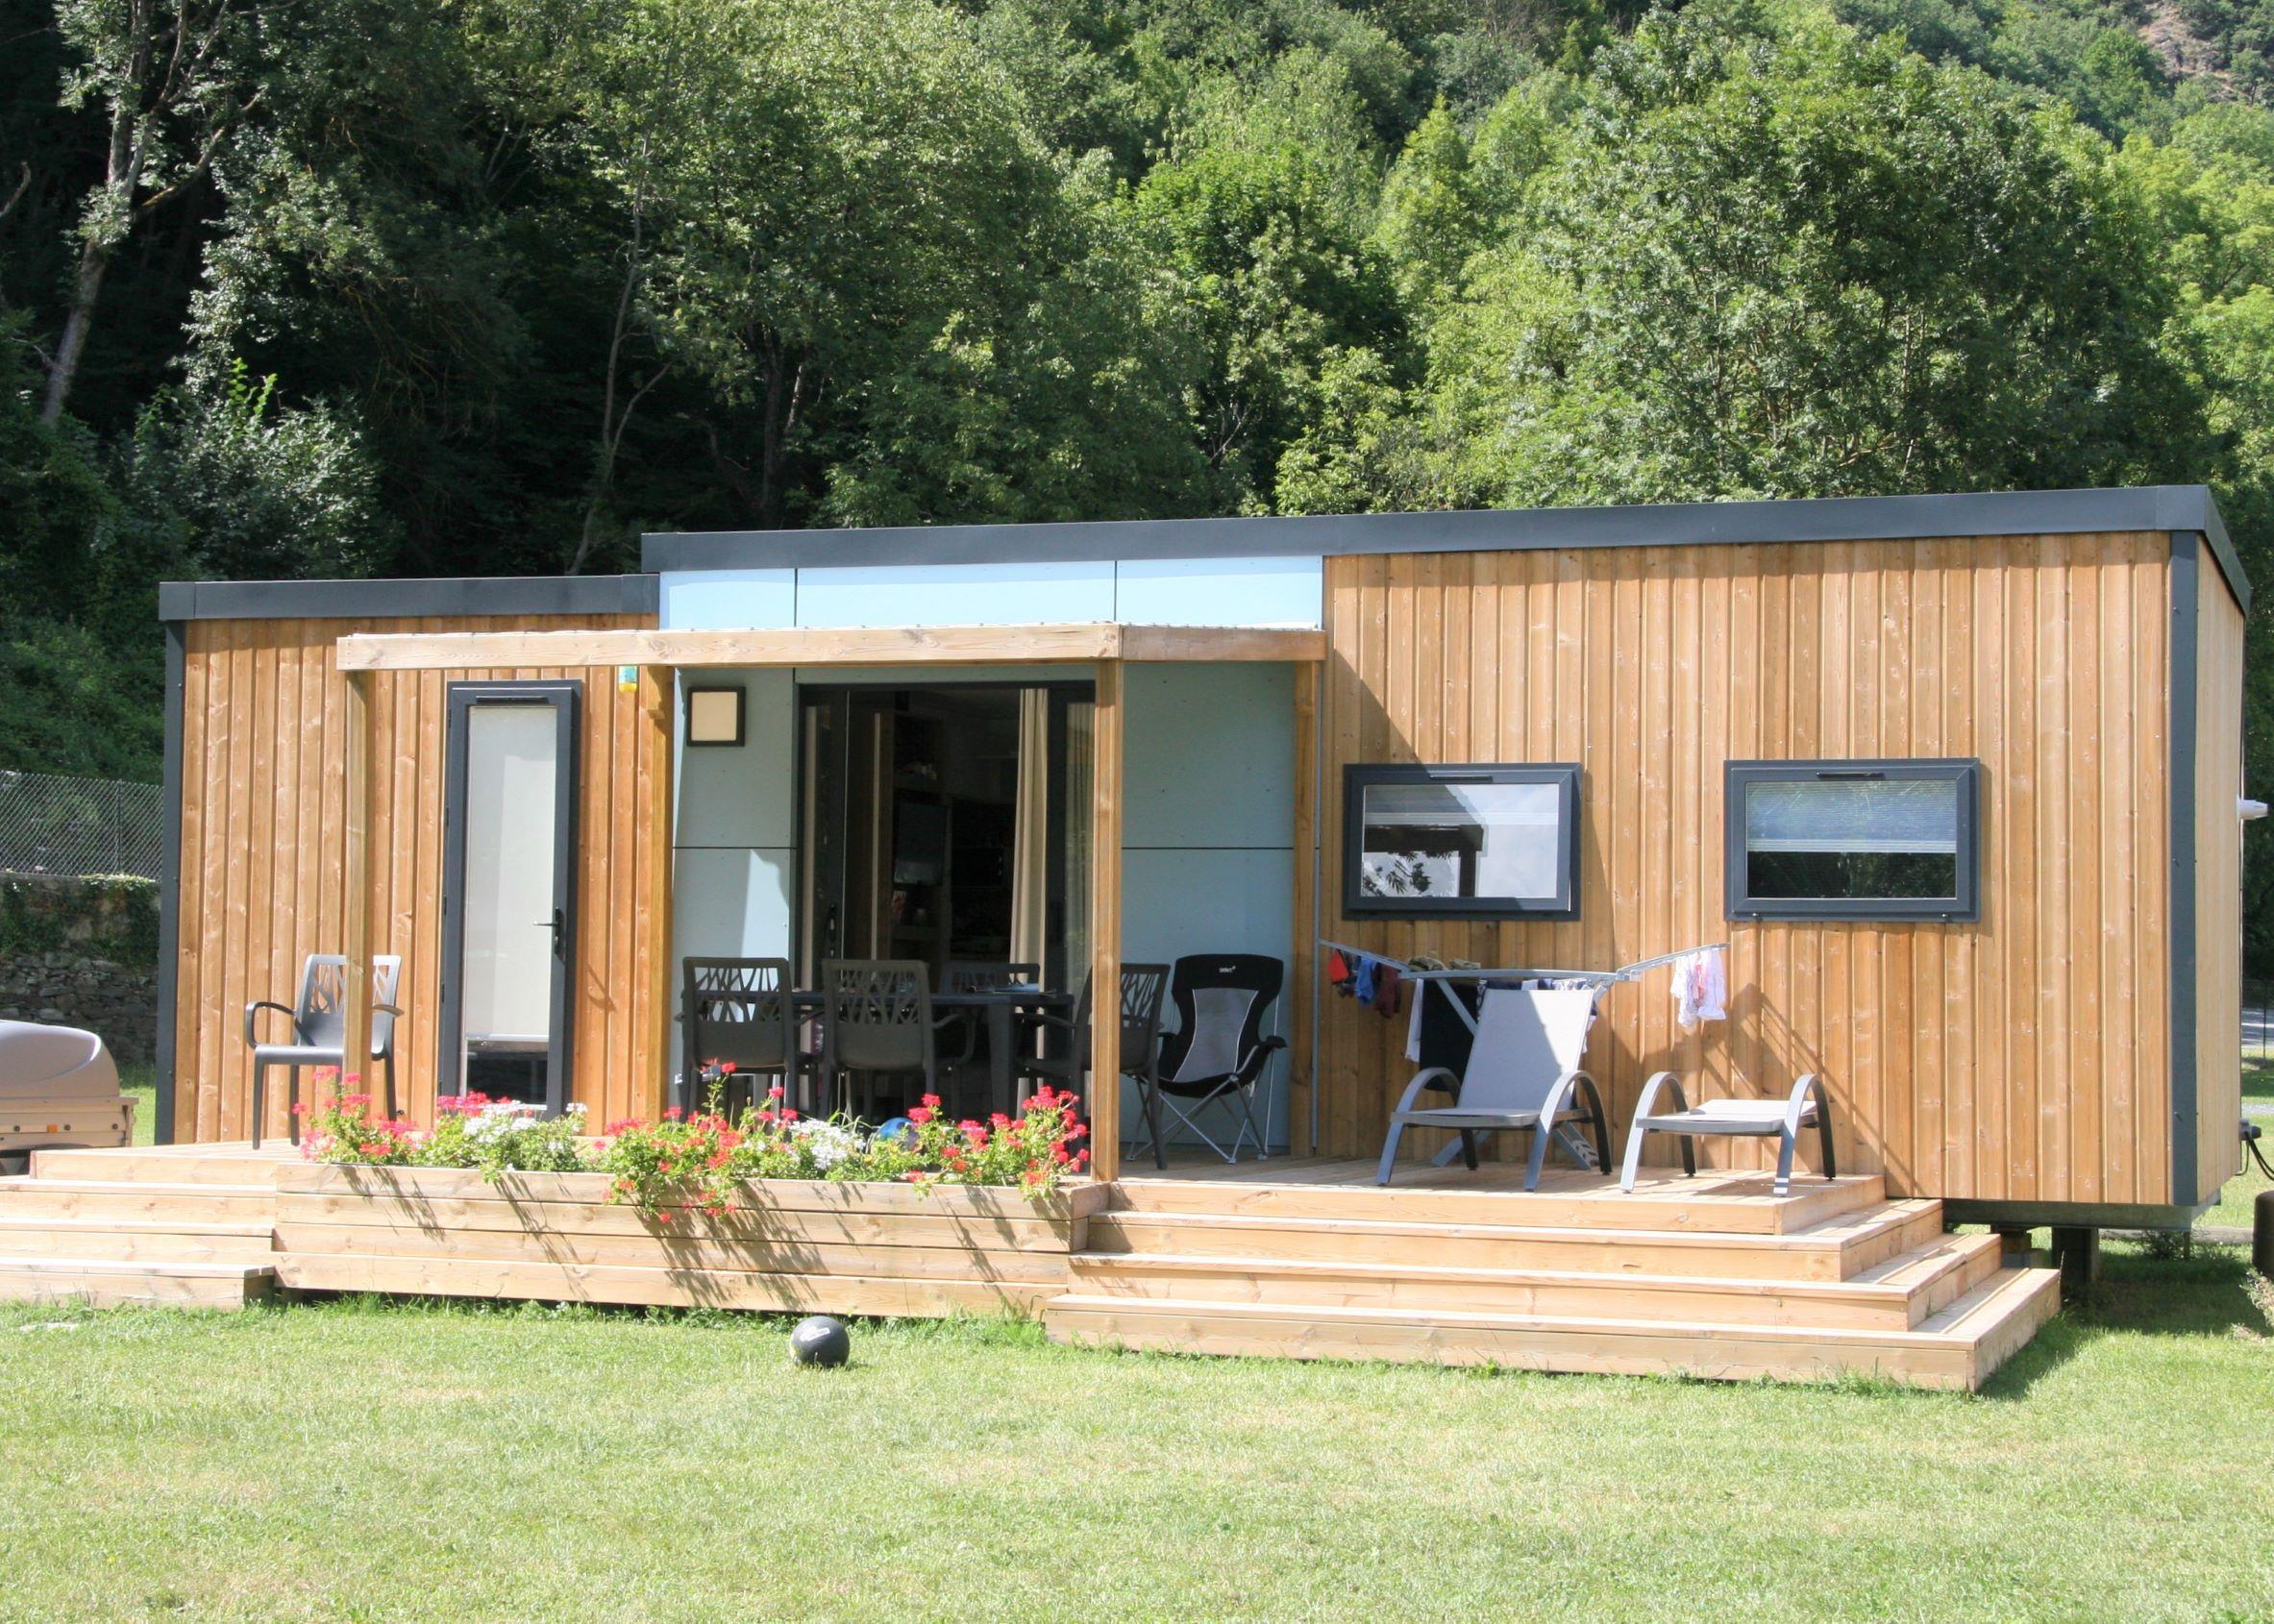 Camping Pradelongue, Moustajon, Haute-Garonne